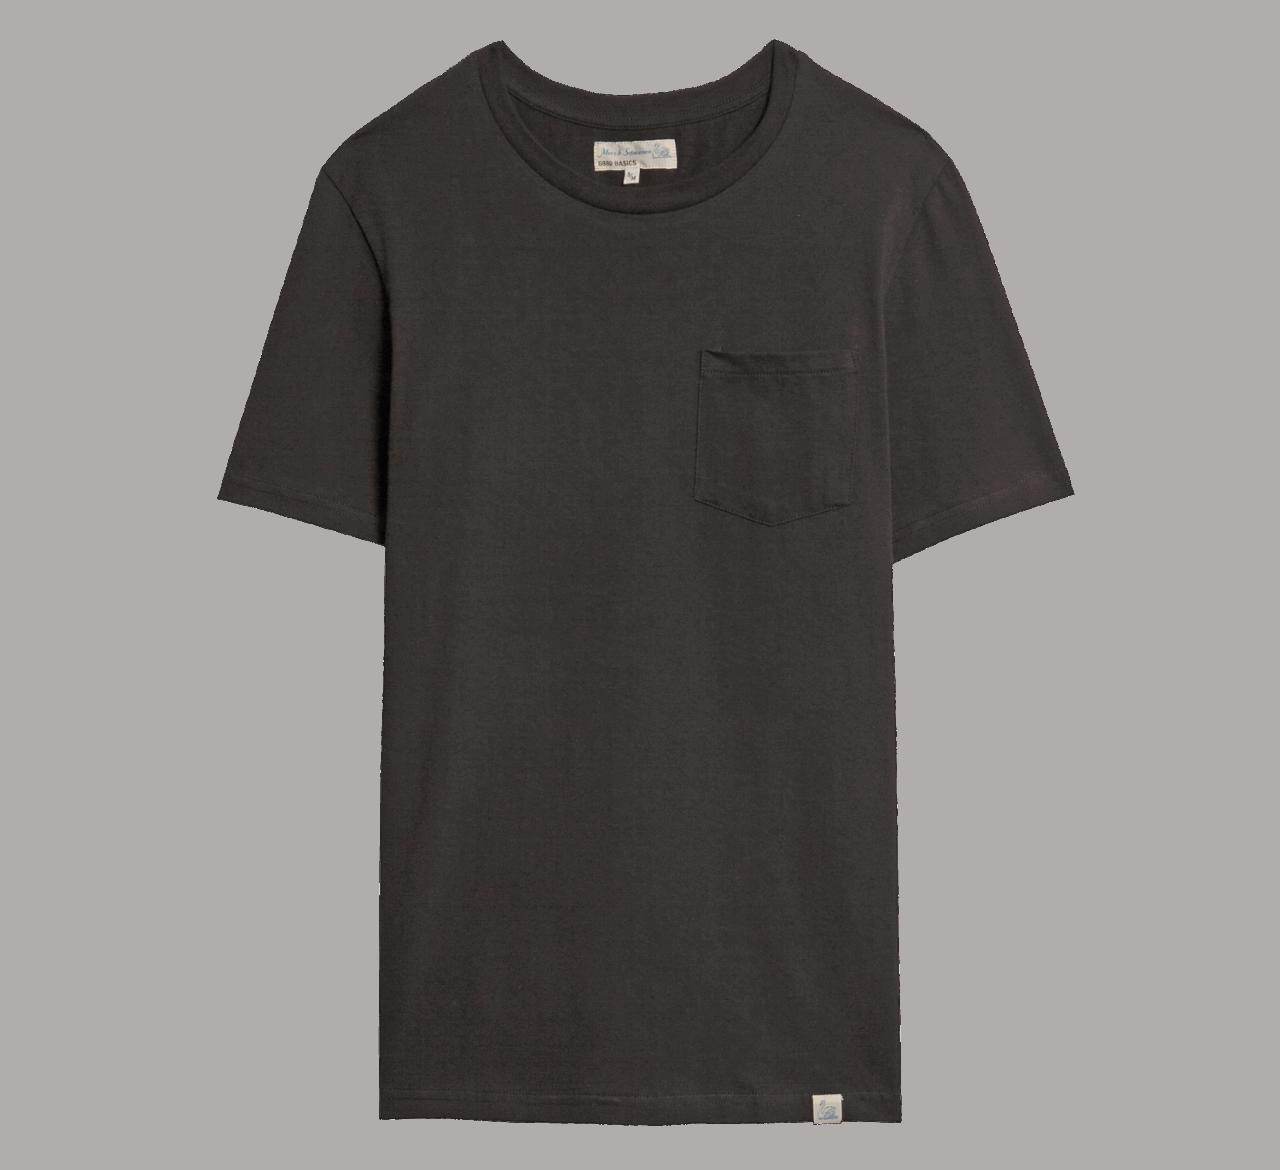 Merz beim Schwanen Basic Pocket T-Shirt - Black